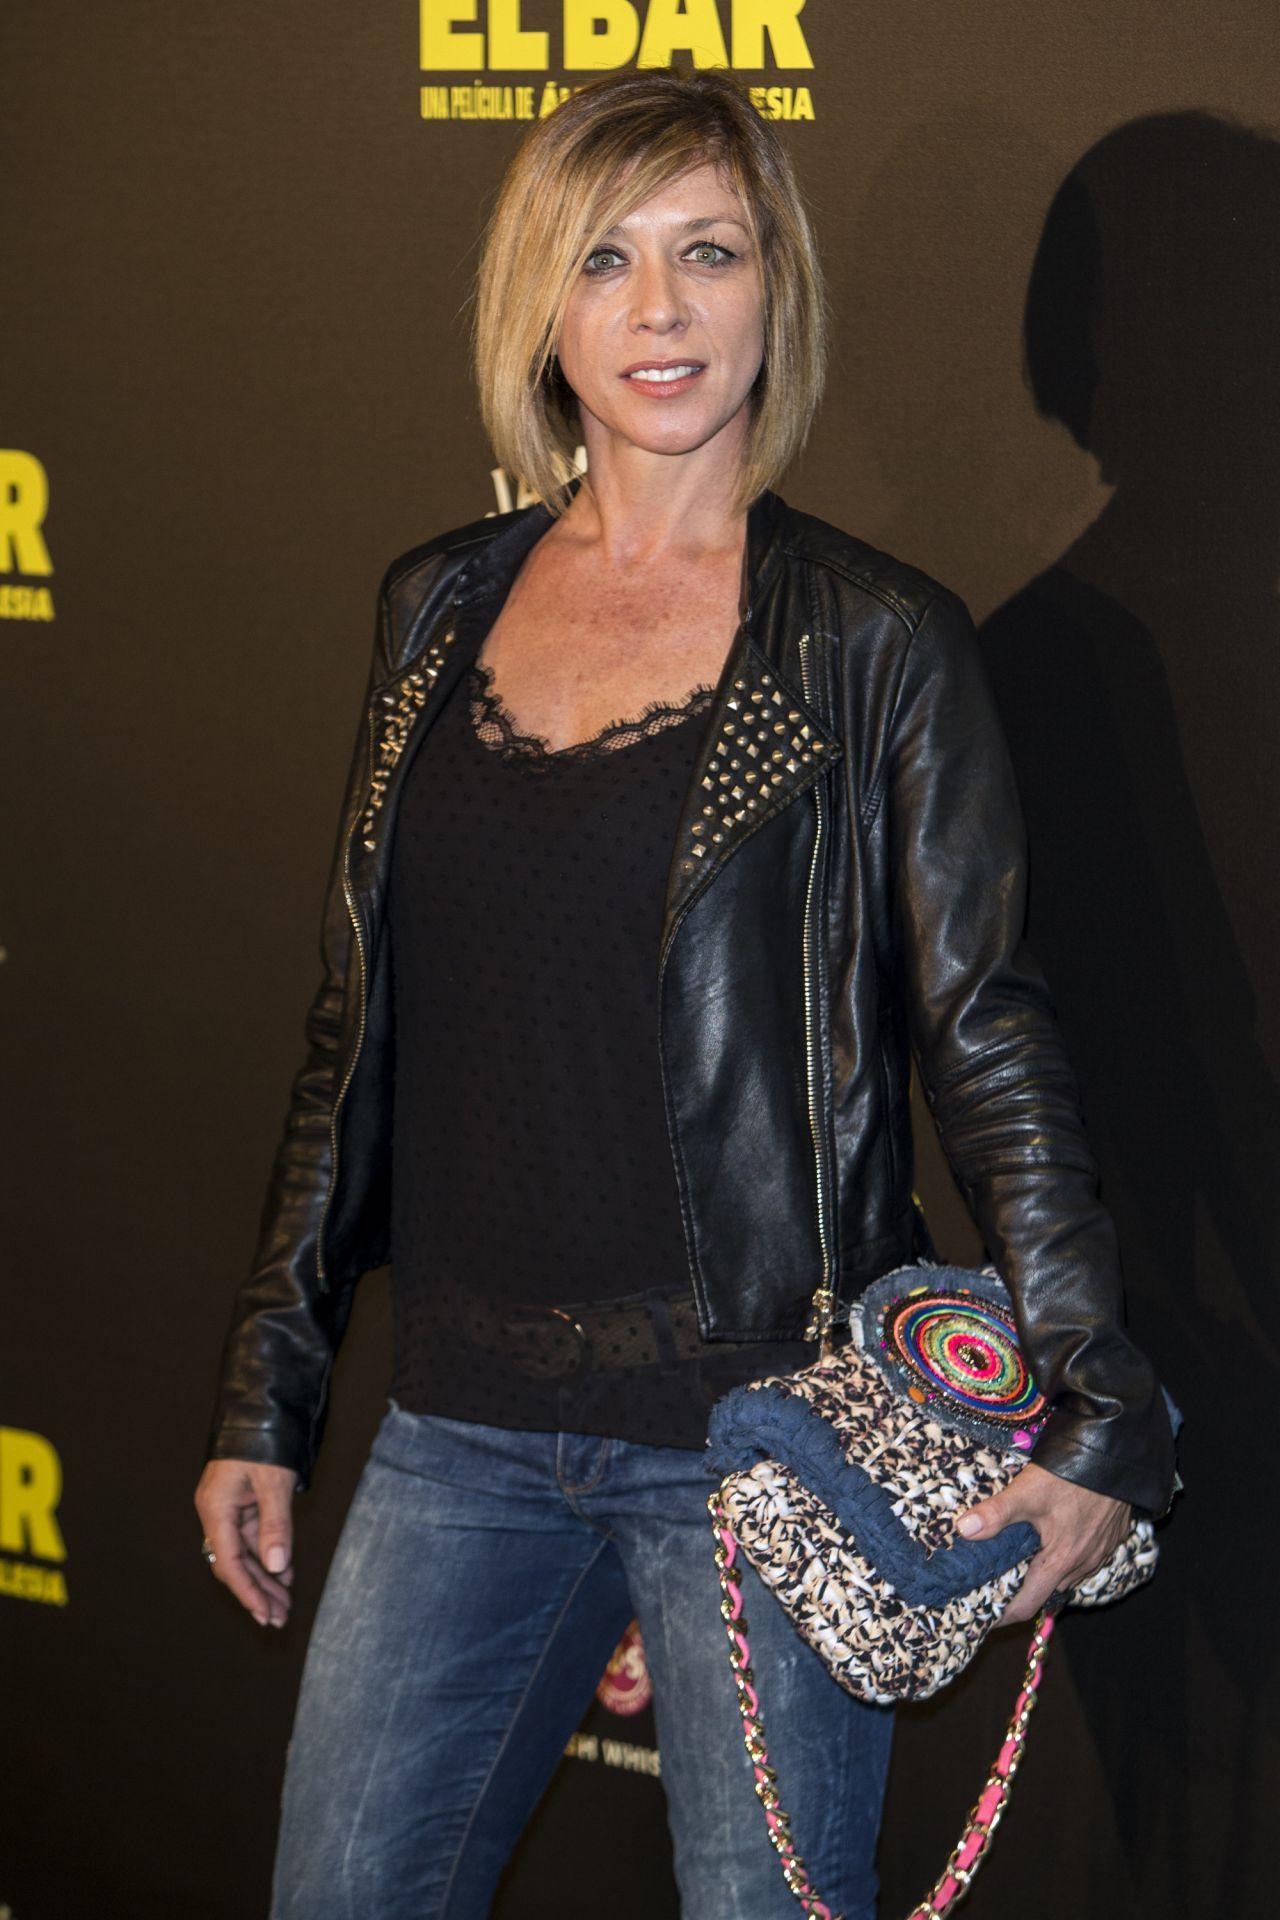 Juana Acosta - El Bar Movie Premiere in Madrid 3/22